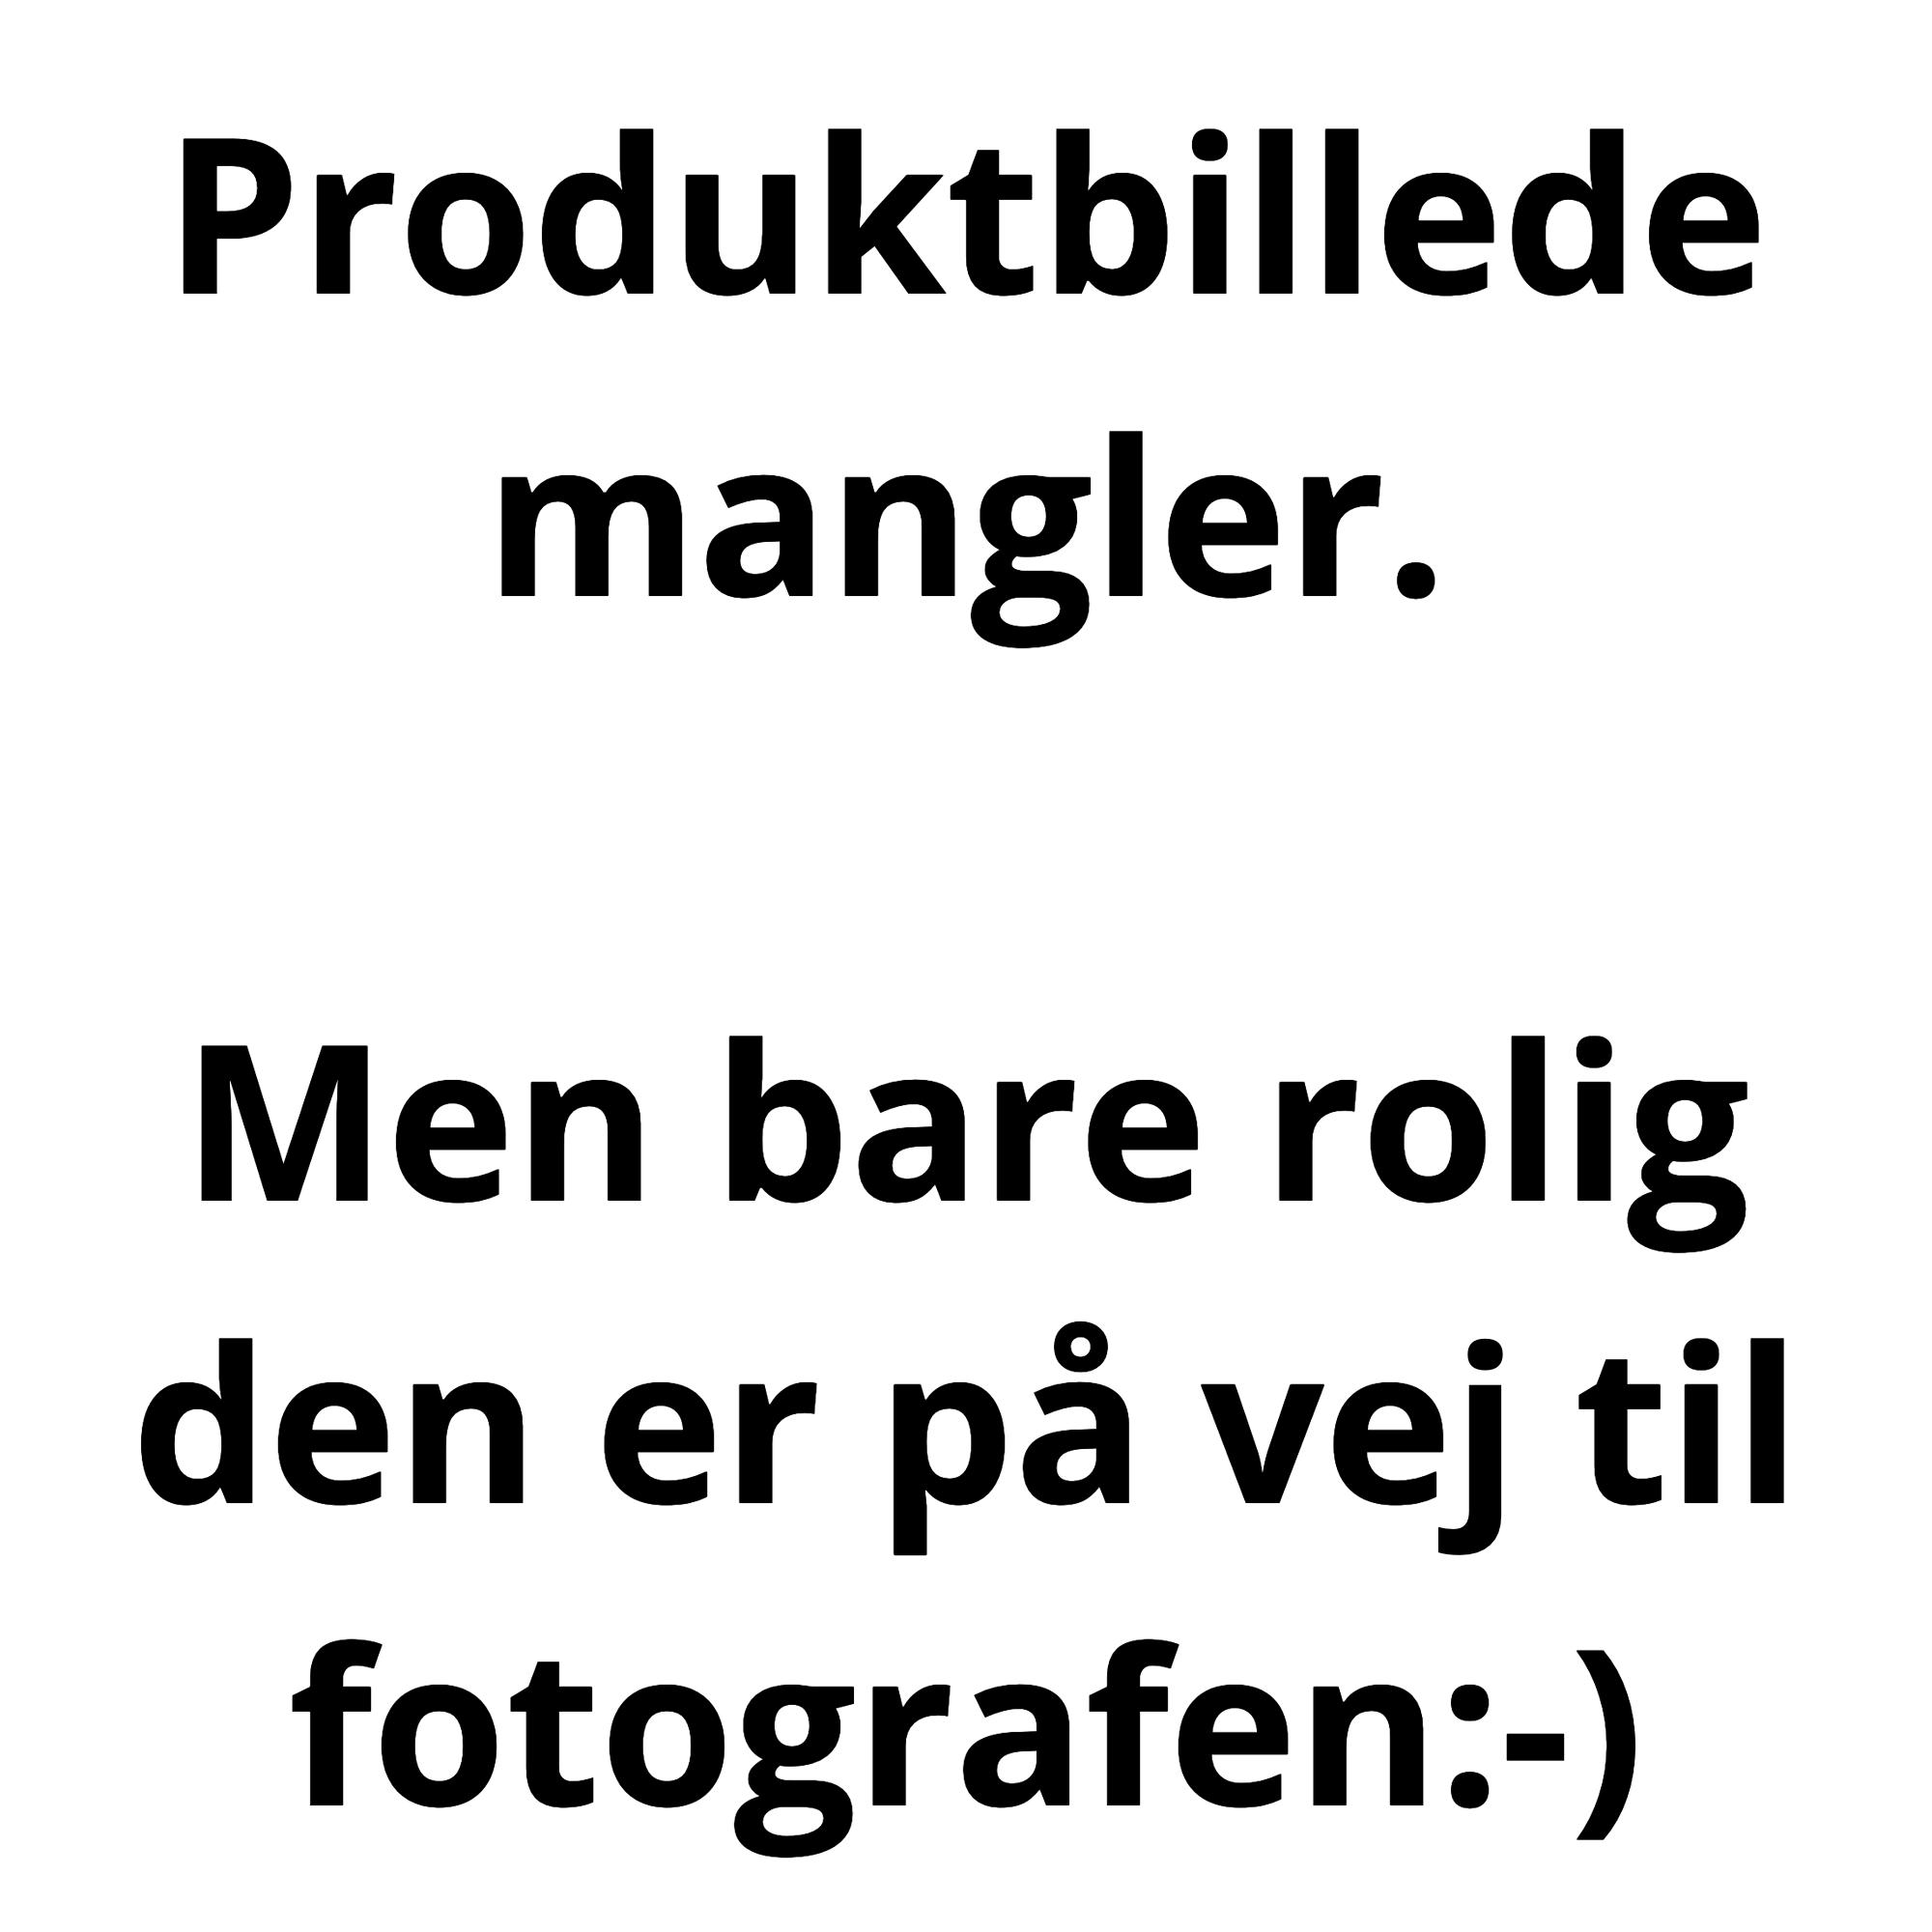 Brodit Passiv kabeltilslutnings holder lightning til USB Apple iPhone 6 Plus/6S Plus/7 Plus/8 Plus/X/XR/Xs/Xs Max B:75-89 D:6-10 - 514667